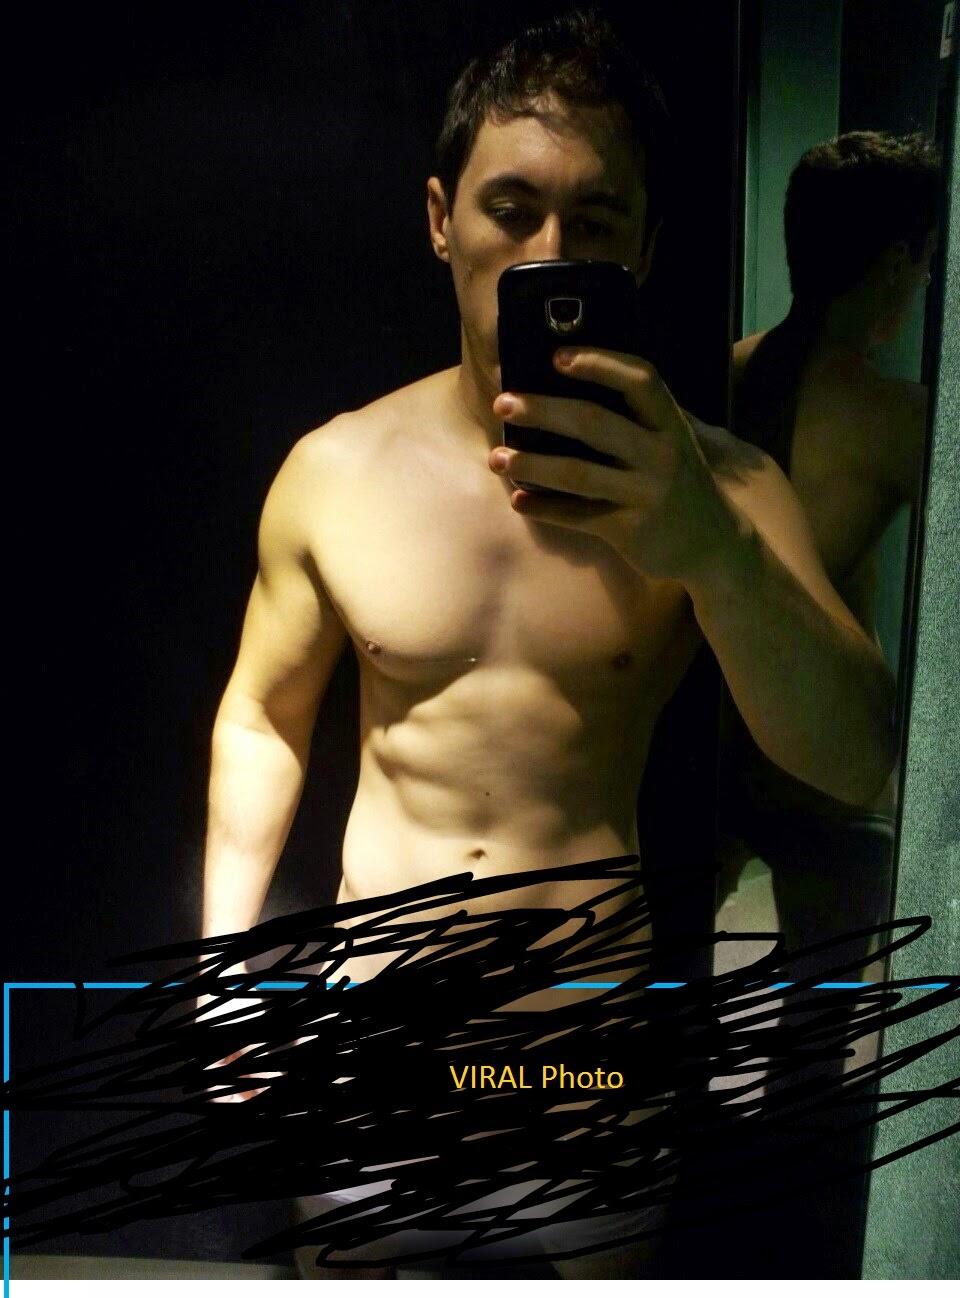 Arjo Atayde Photo Scandal Went Viral - Real Or Fake -5244